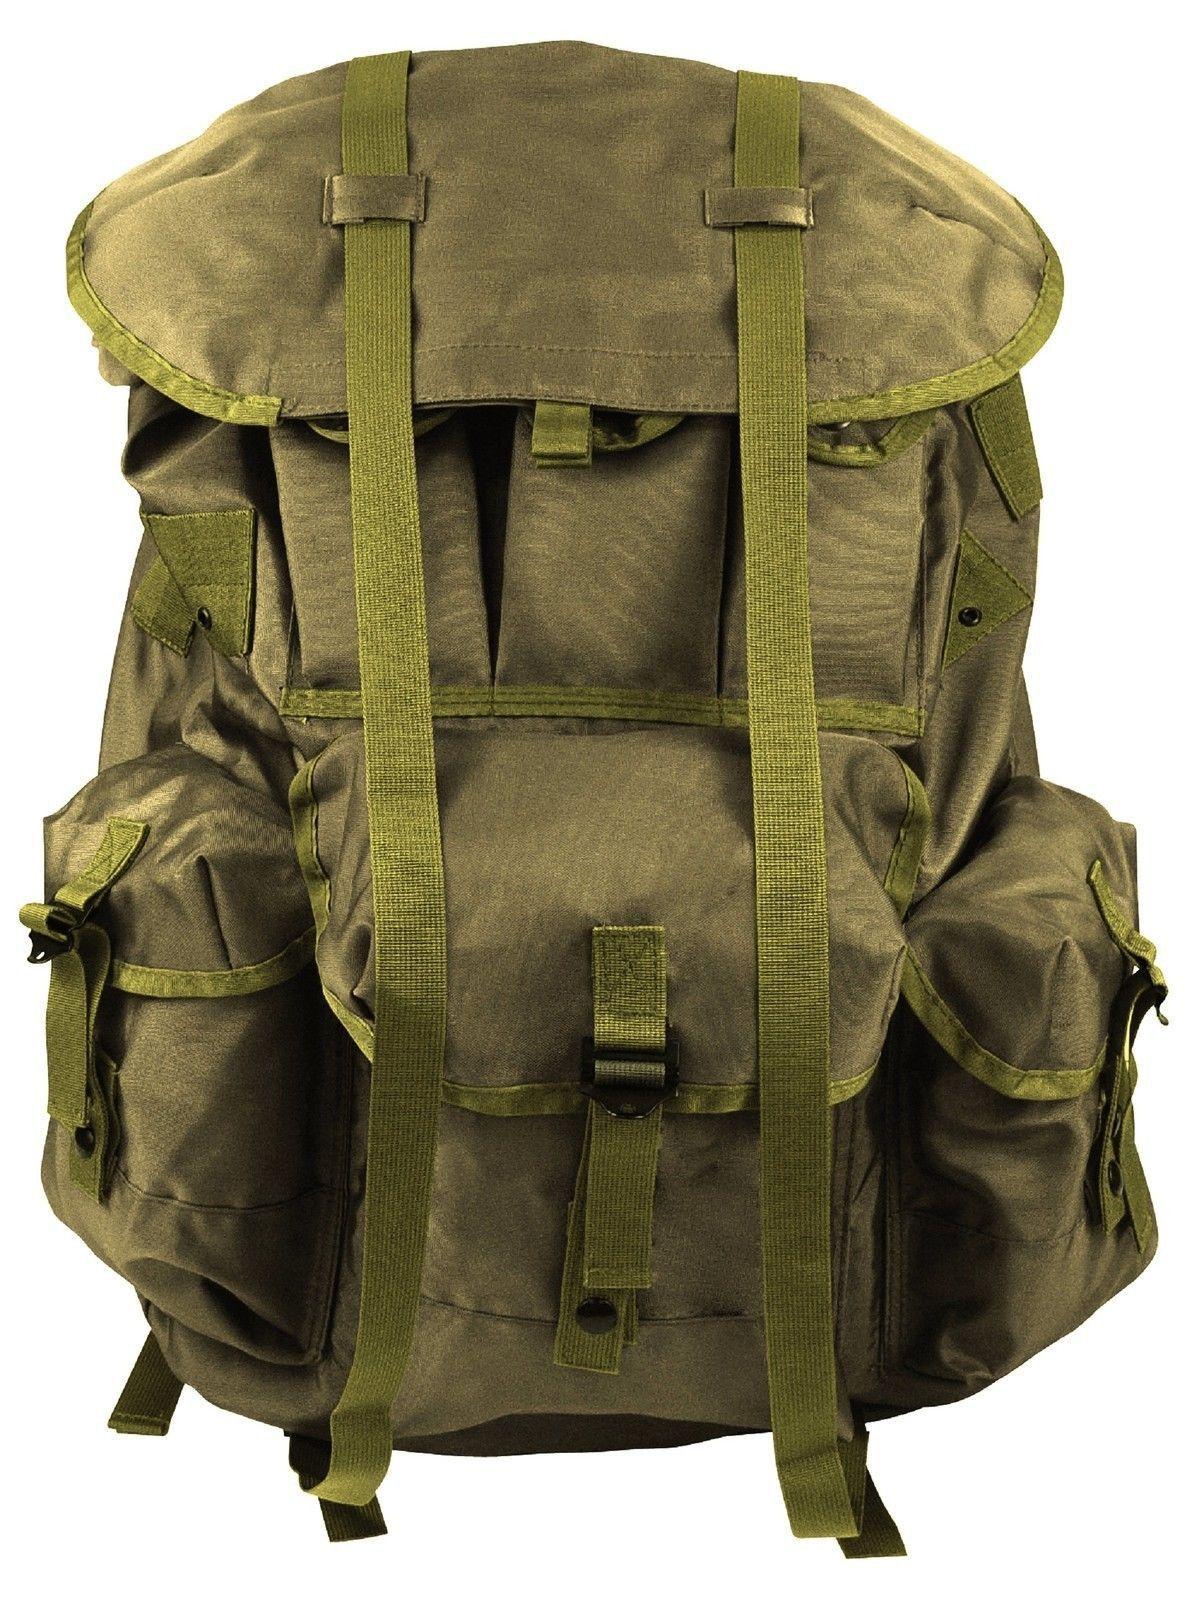 4ef758792b ALICE Packs Military Type Hiking Camping Framed Rucksack Backpack ...